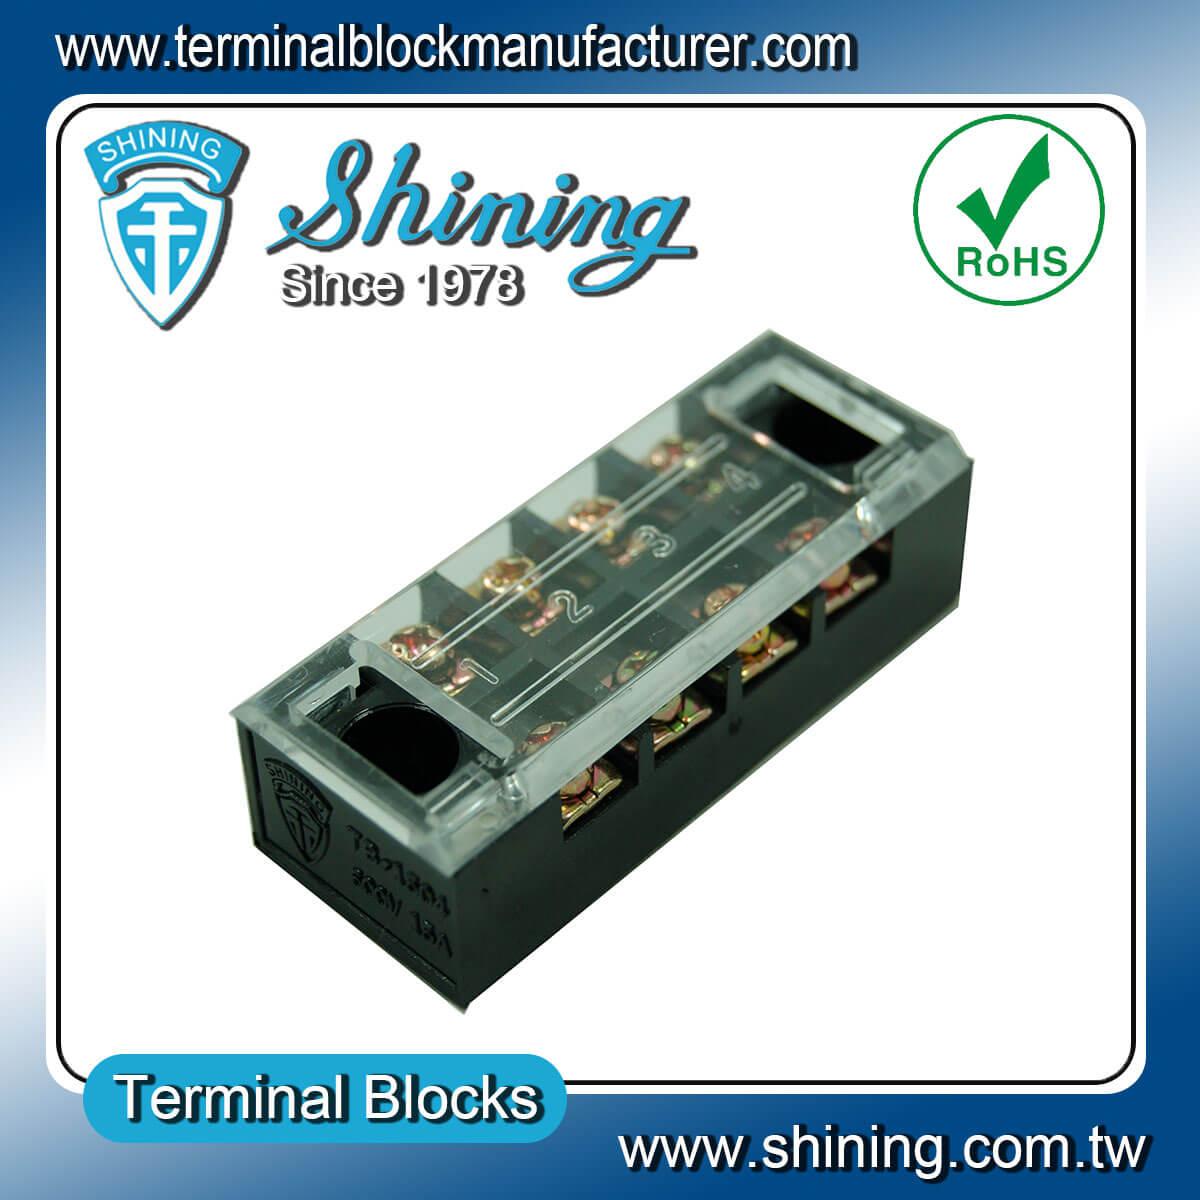 TB-1504 600V 15A 4Pole固定式柵欄端子台